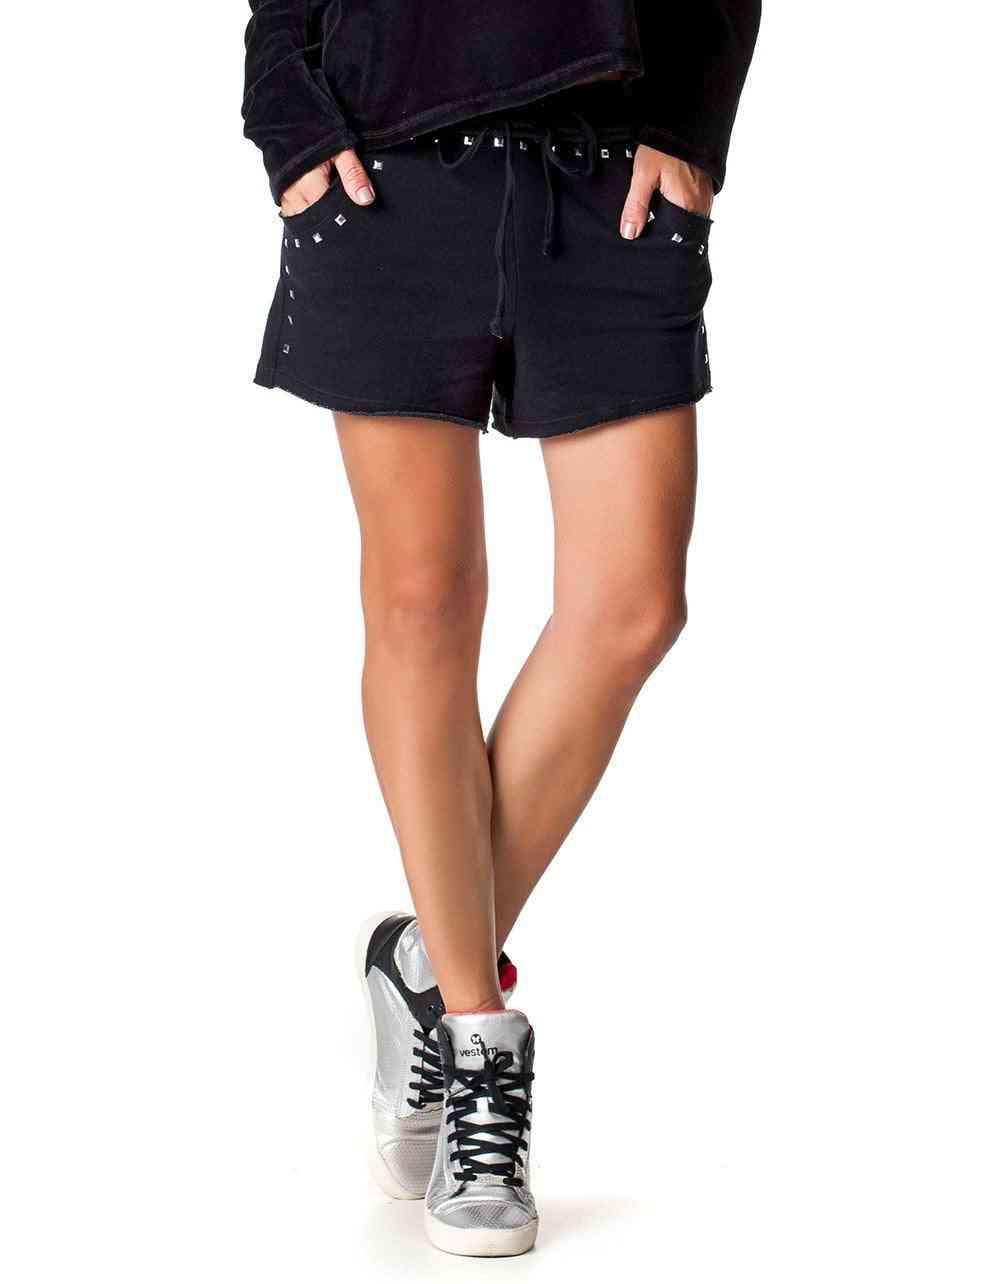 Loose-fitting Sweats Shorts